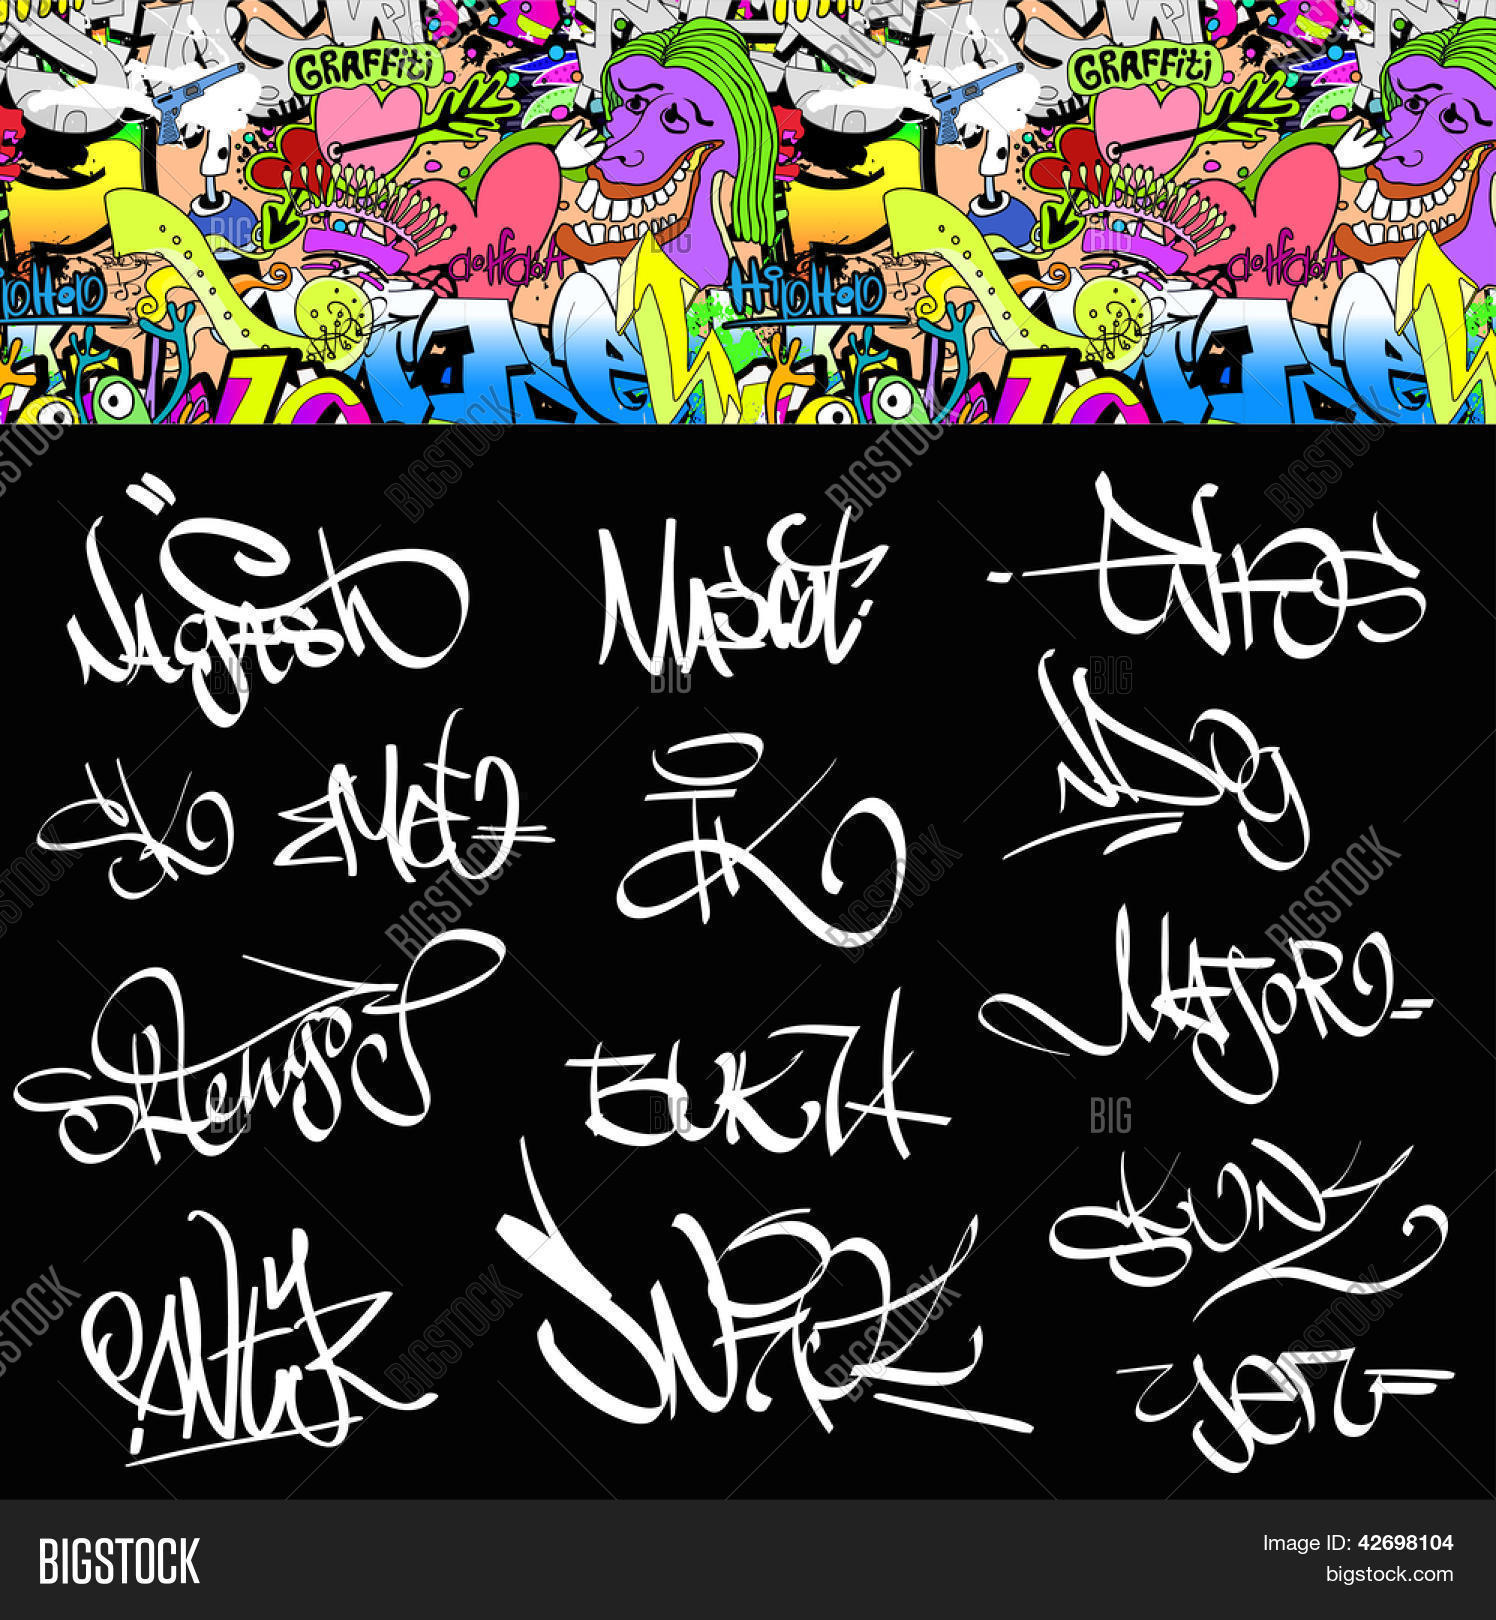 Graffiti Font Tags Urban Vector & Photo